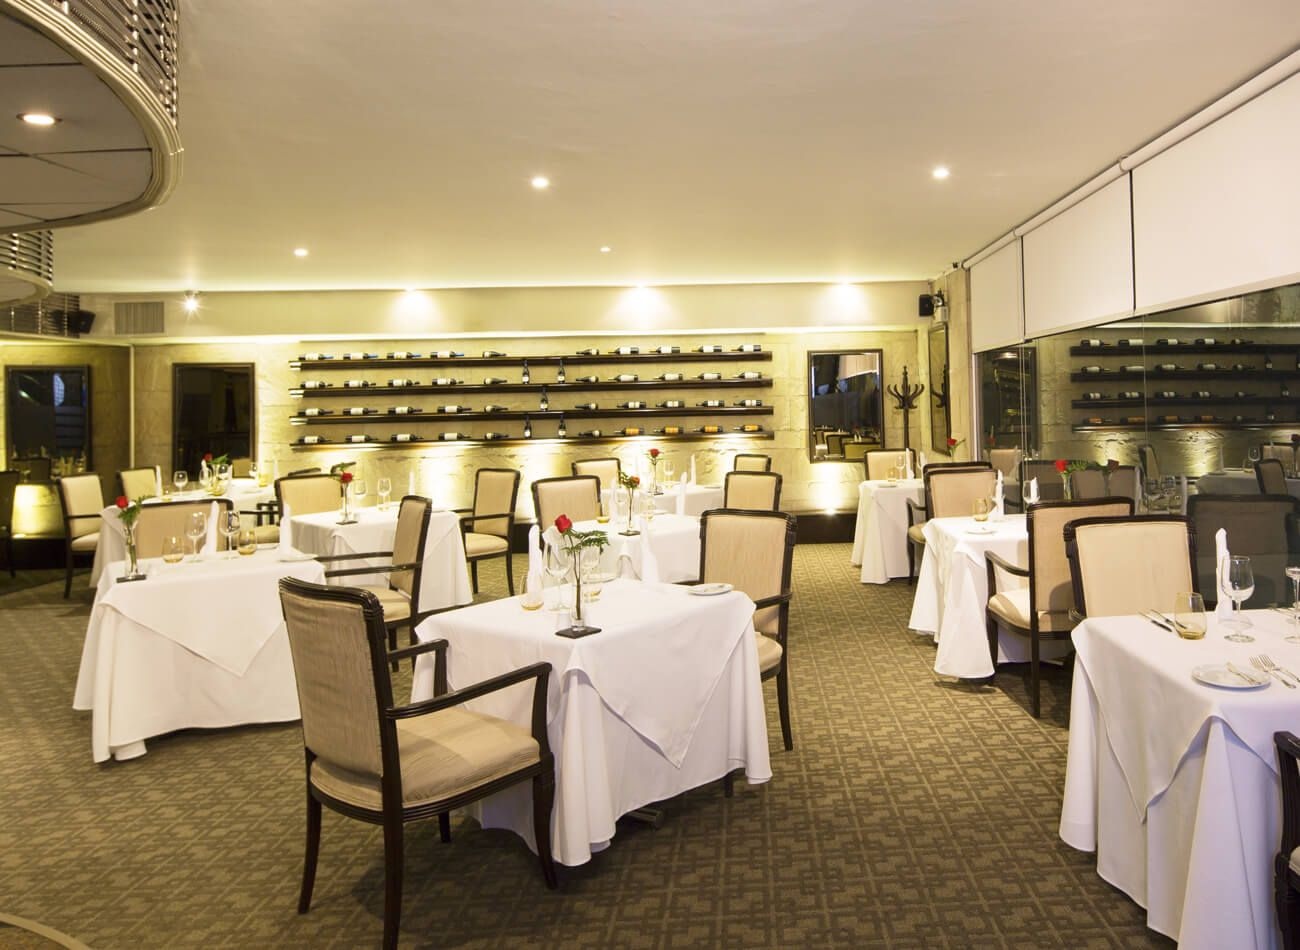 OCEANUS WINE BAR & RESTAURANT - DELFINES HOTEL Calle Los Eucaliptos 555 San Isidro